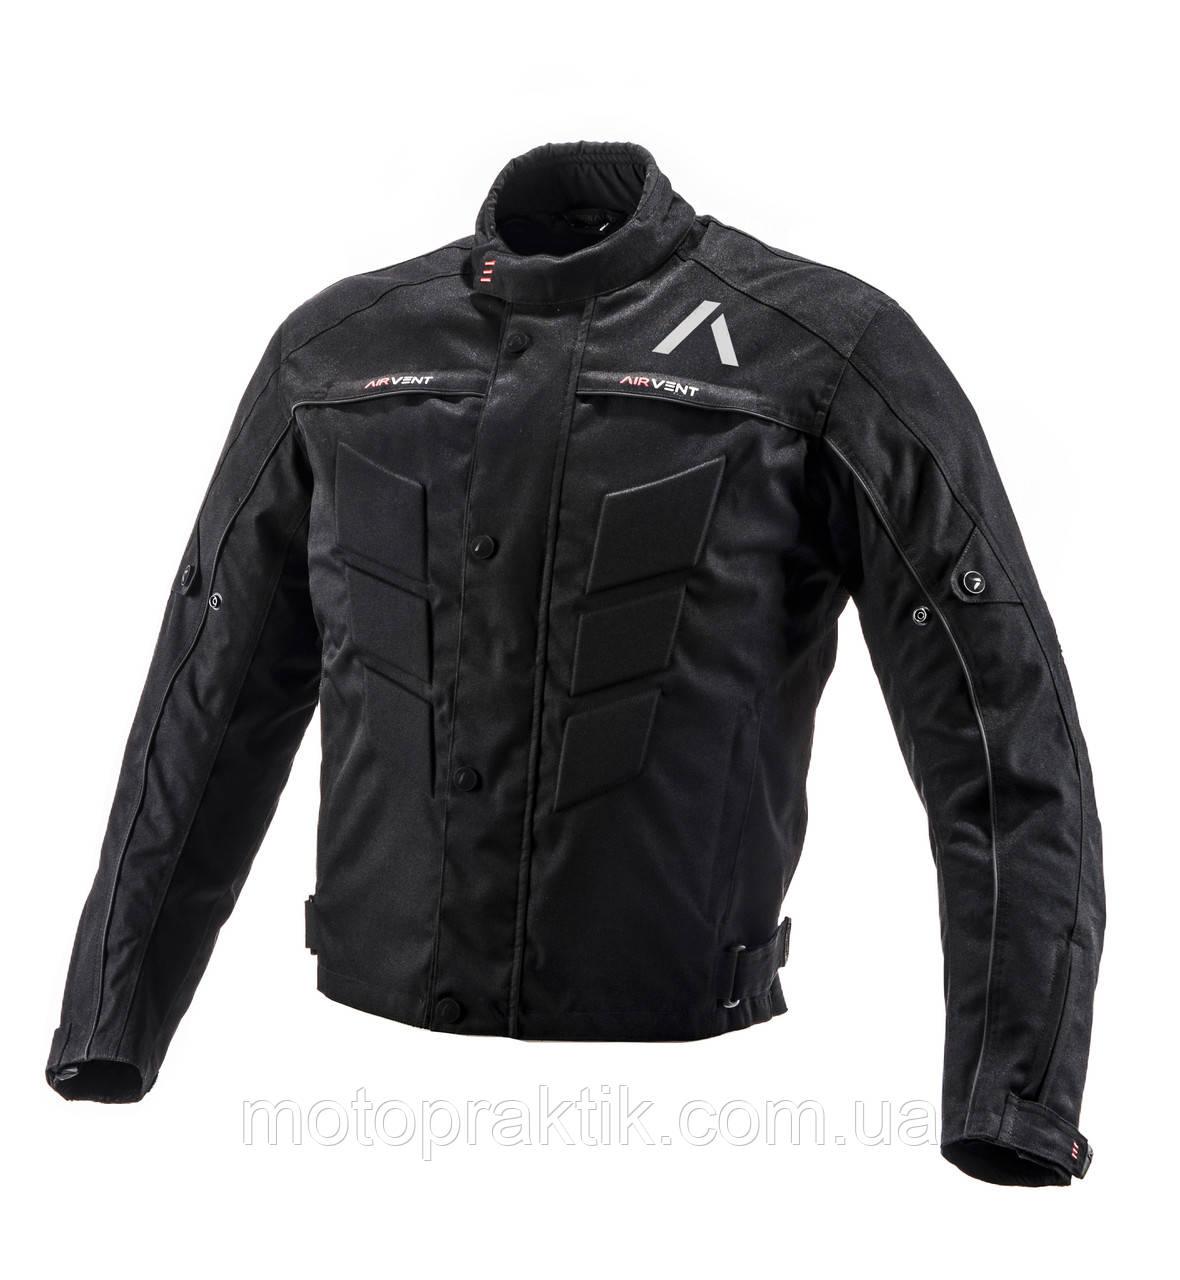 Adrenaline Pyramid 2.0 Jacket Black, XS Мотокуртка текстильная с защитой